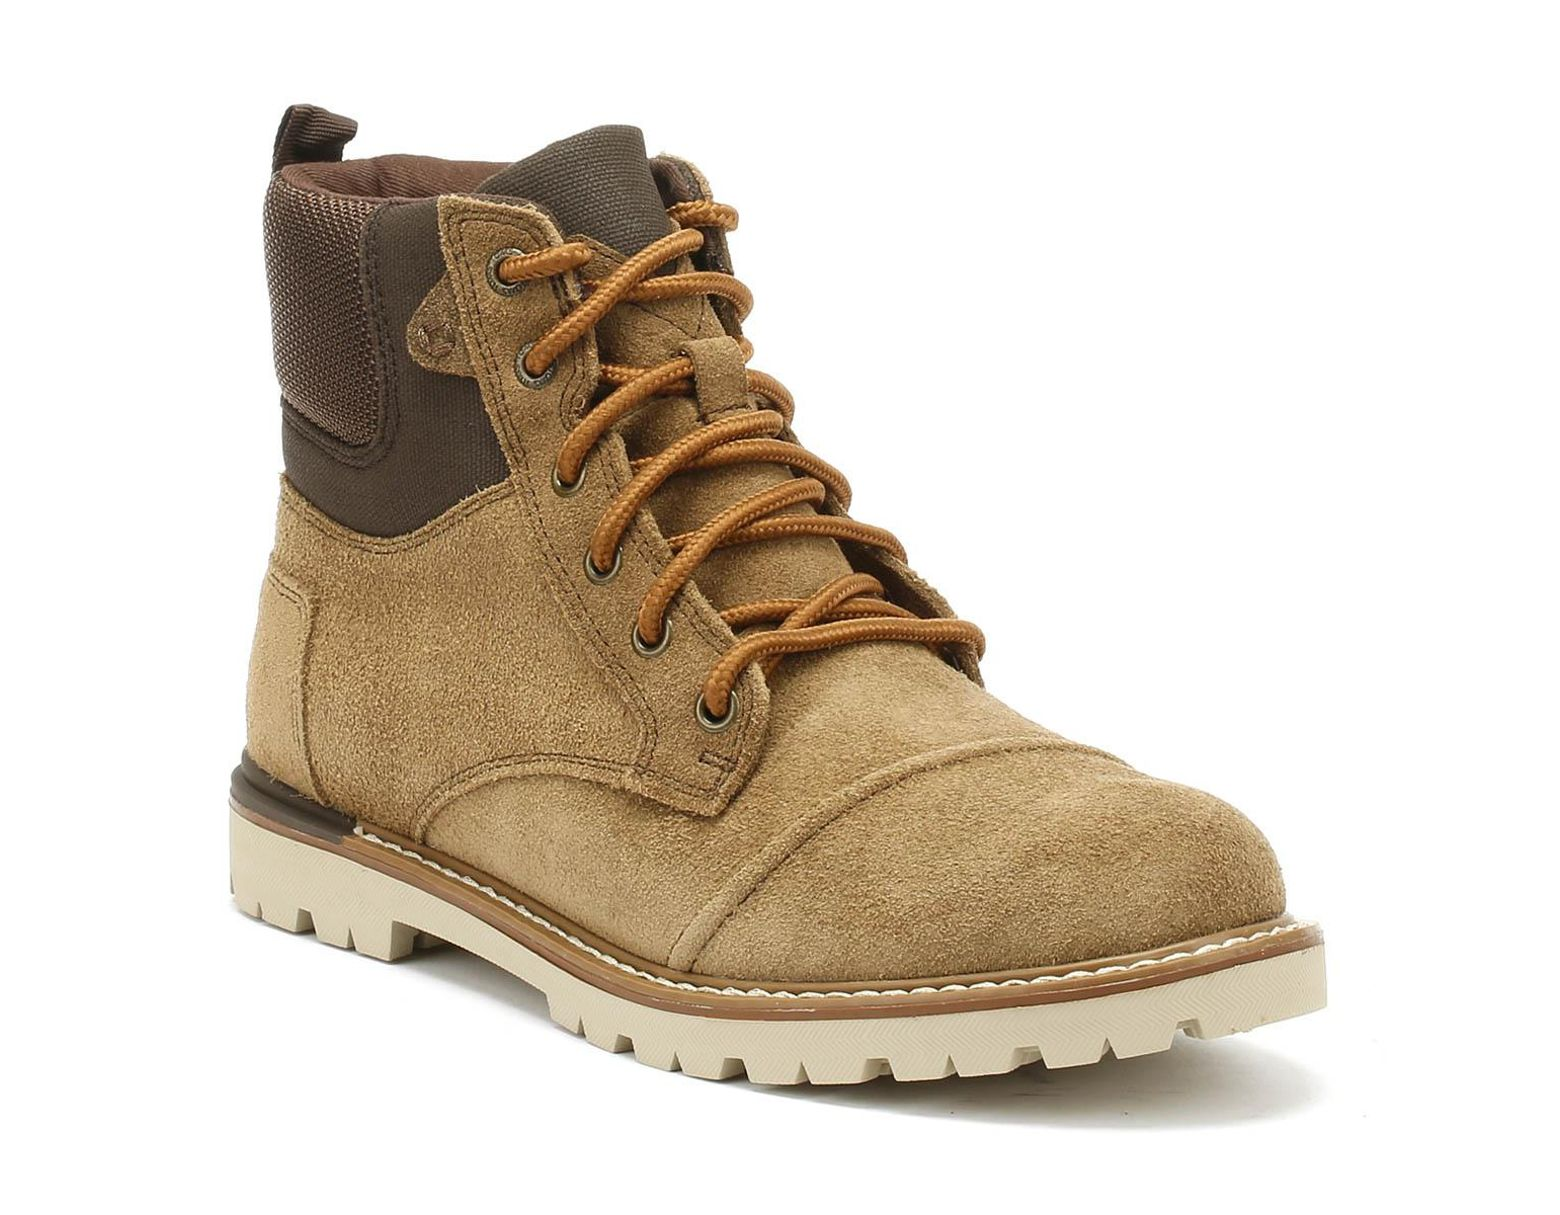 8c33d047856 Ashland Mens Brown Suede Boots